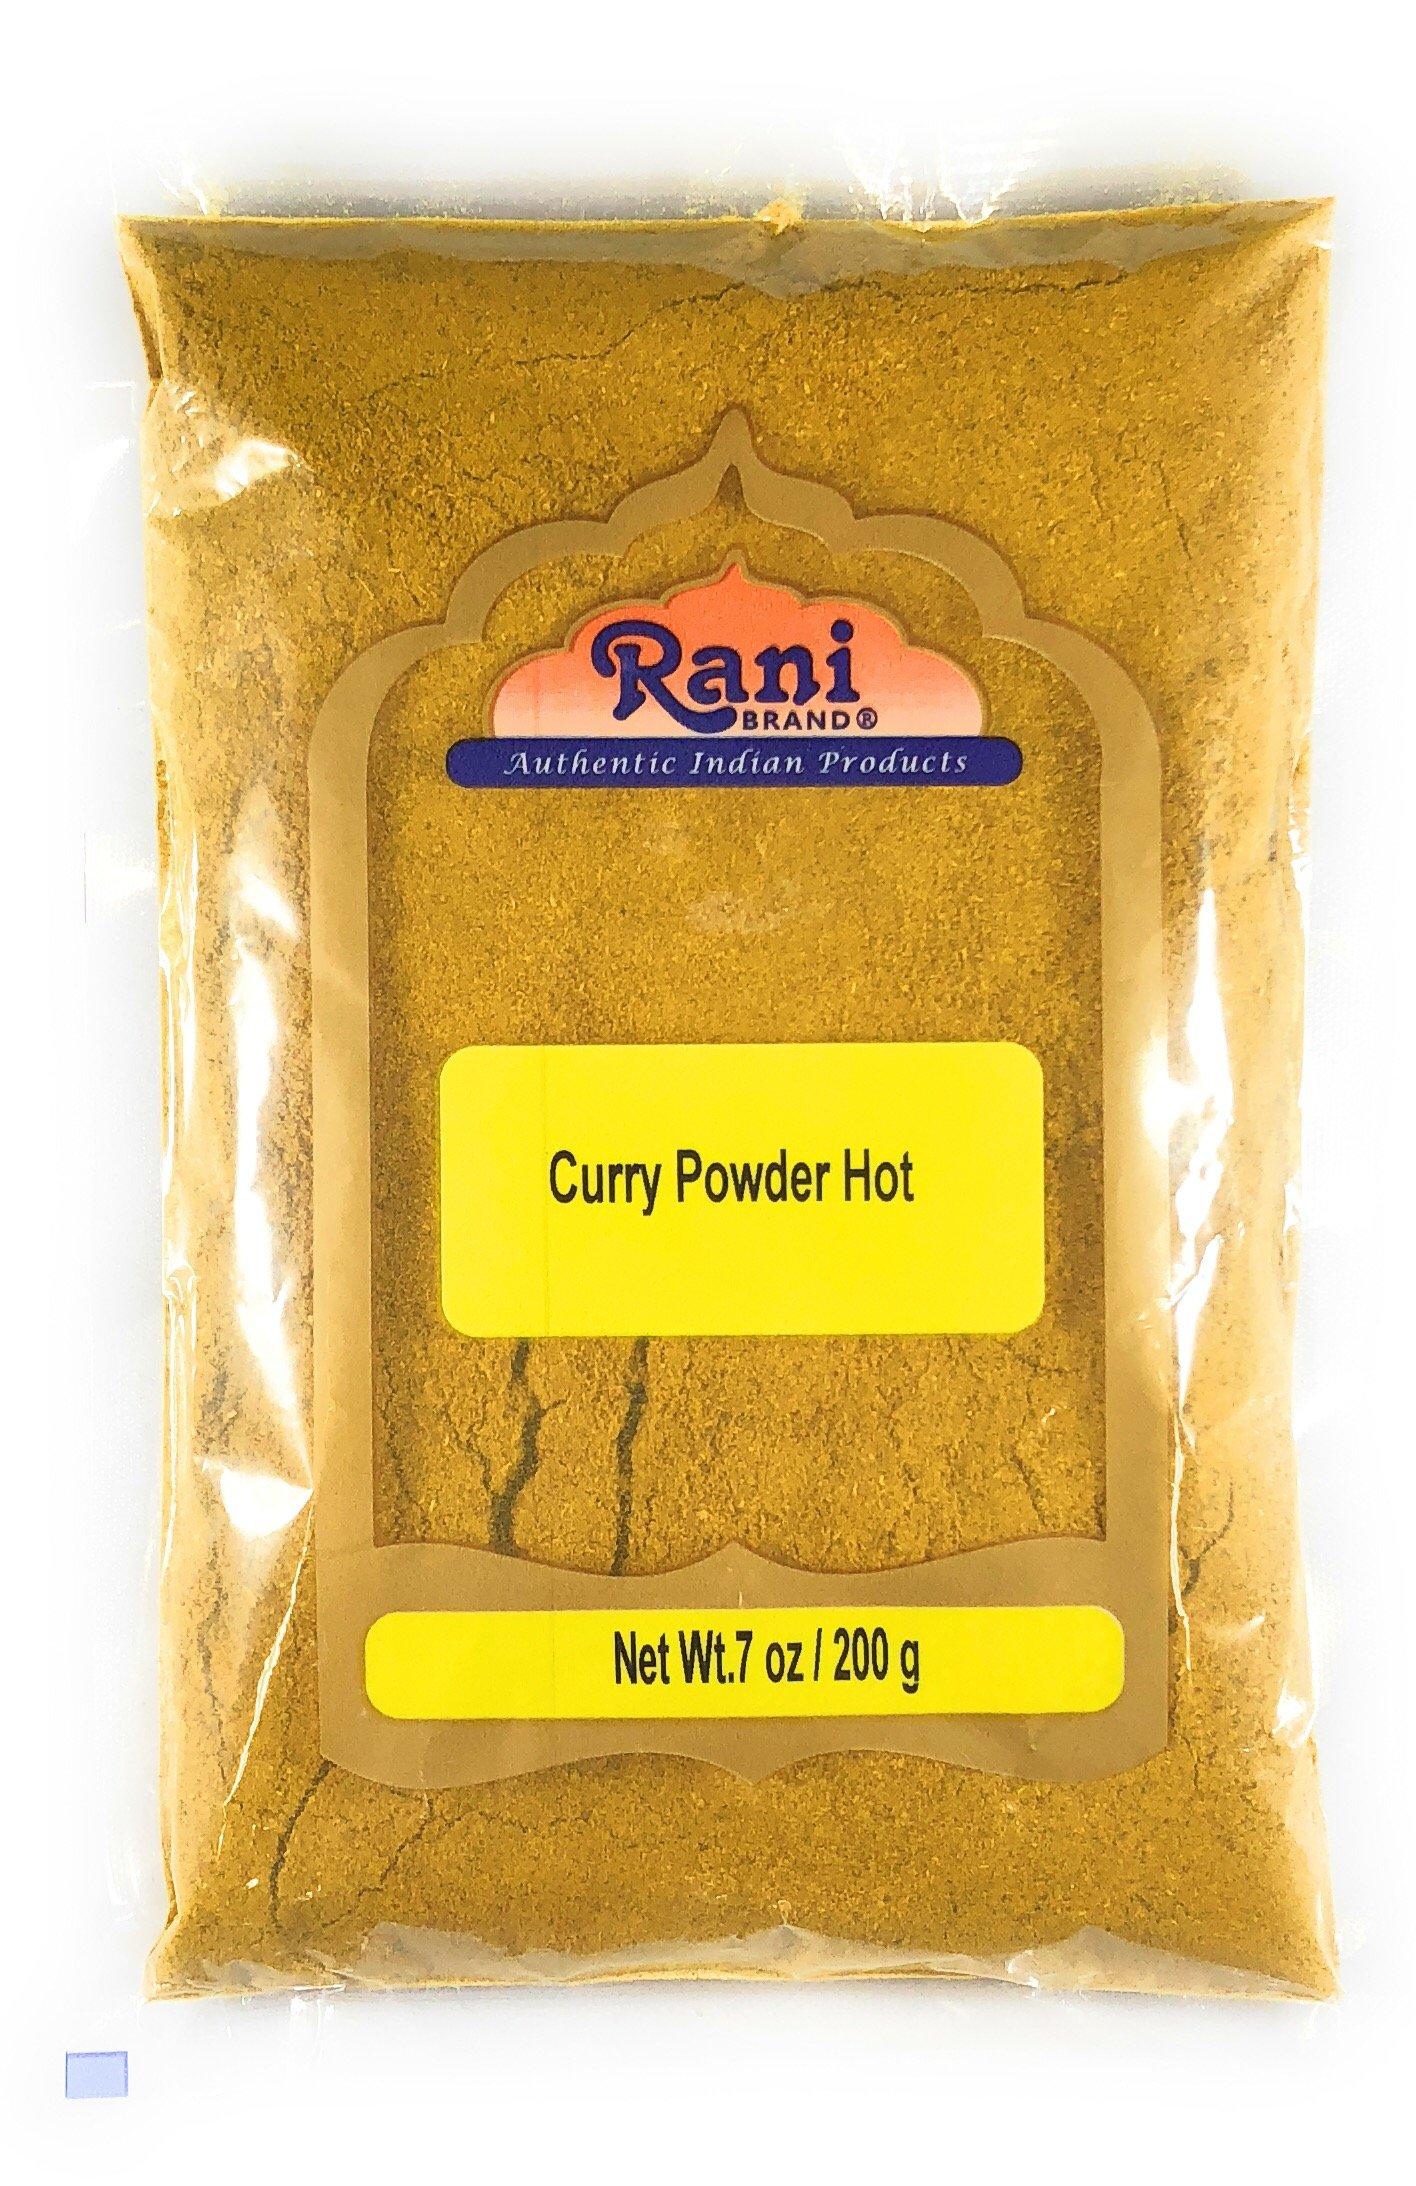 Rani Curry Powder Hot Natural 11-Spice Blend 200g (7oz) ~ Salt Free | Vegan | Gluten Free Ingredients | NON-GMO